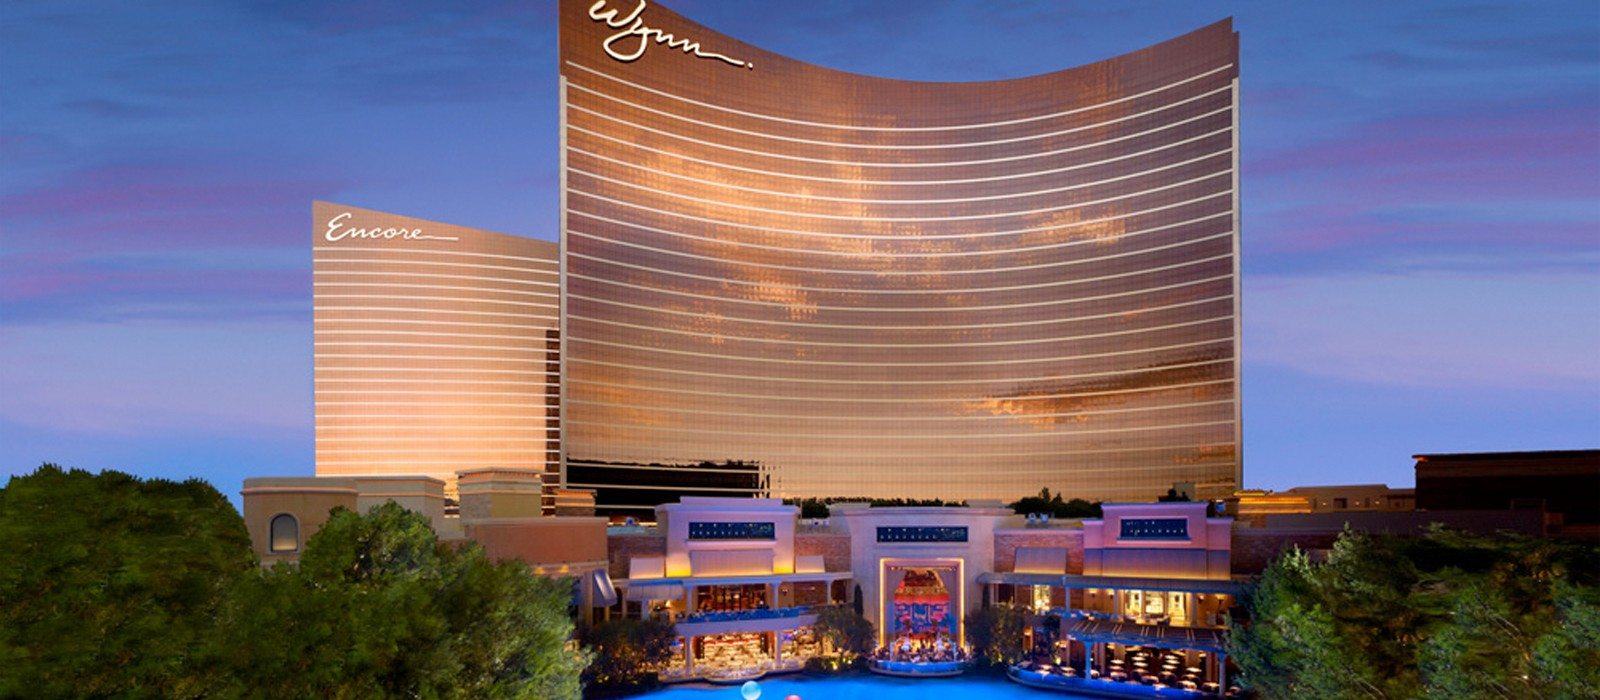 Las Vegas holidays - The Wynn Las Vegas - Header